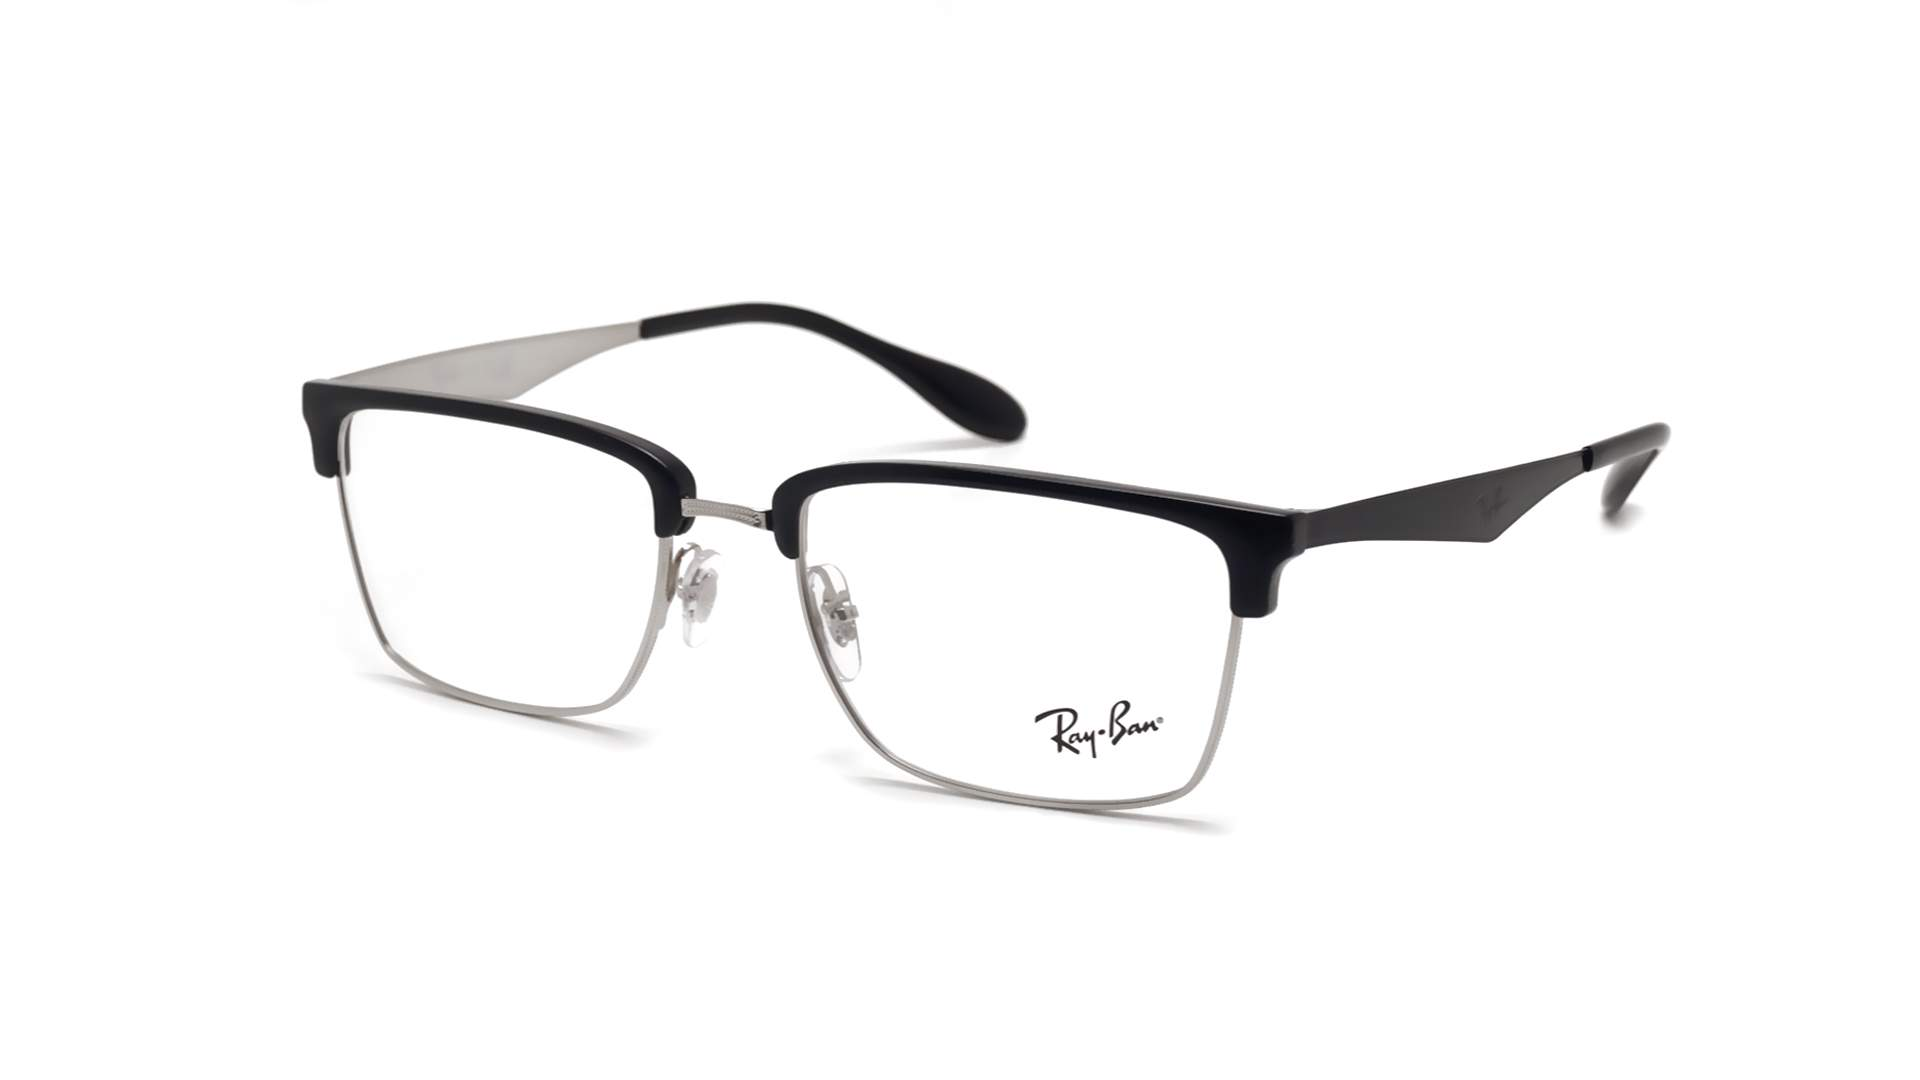 287362a3715 Eyeglasses Ray-Ban RX6397 RB6397 2932 54-19 Black Large